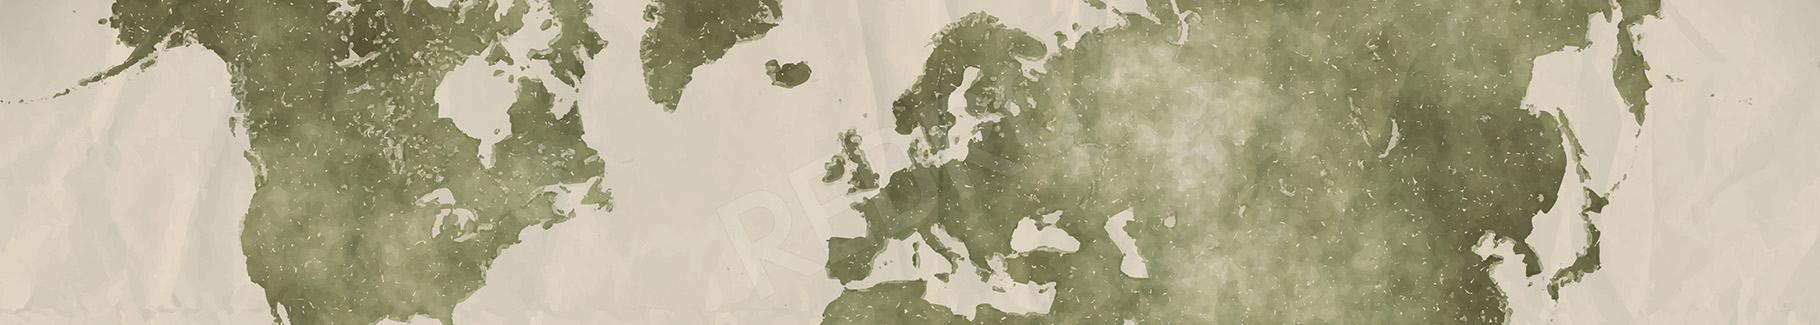 Fototapeta Europa do sypialni